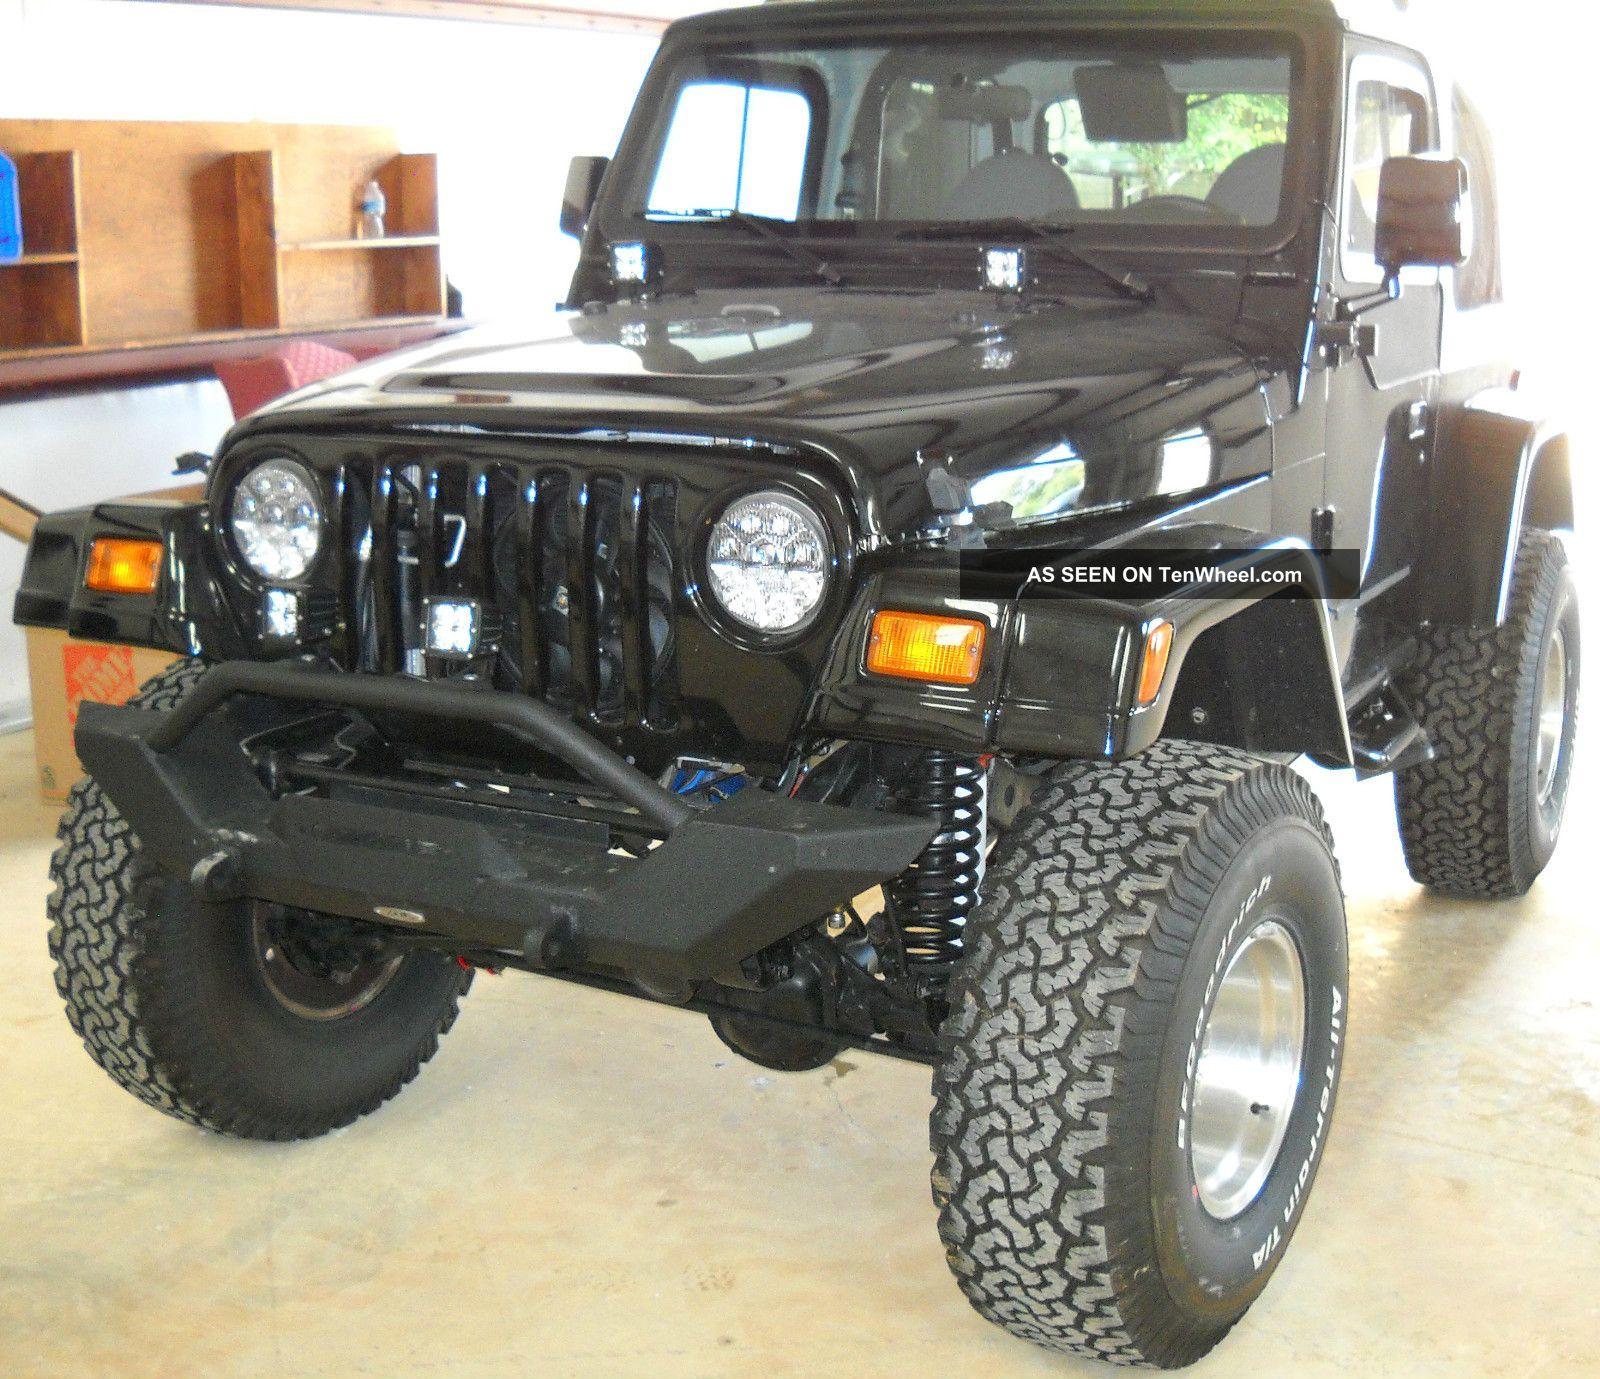 1998 Jeep Wrangler Total Off Frame Restoration With